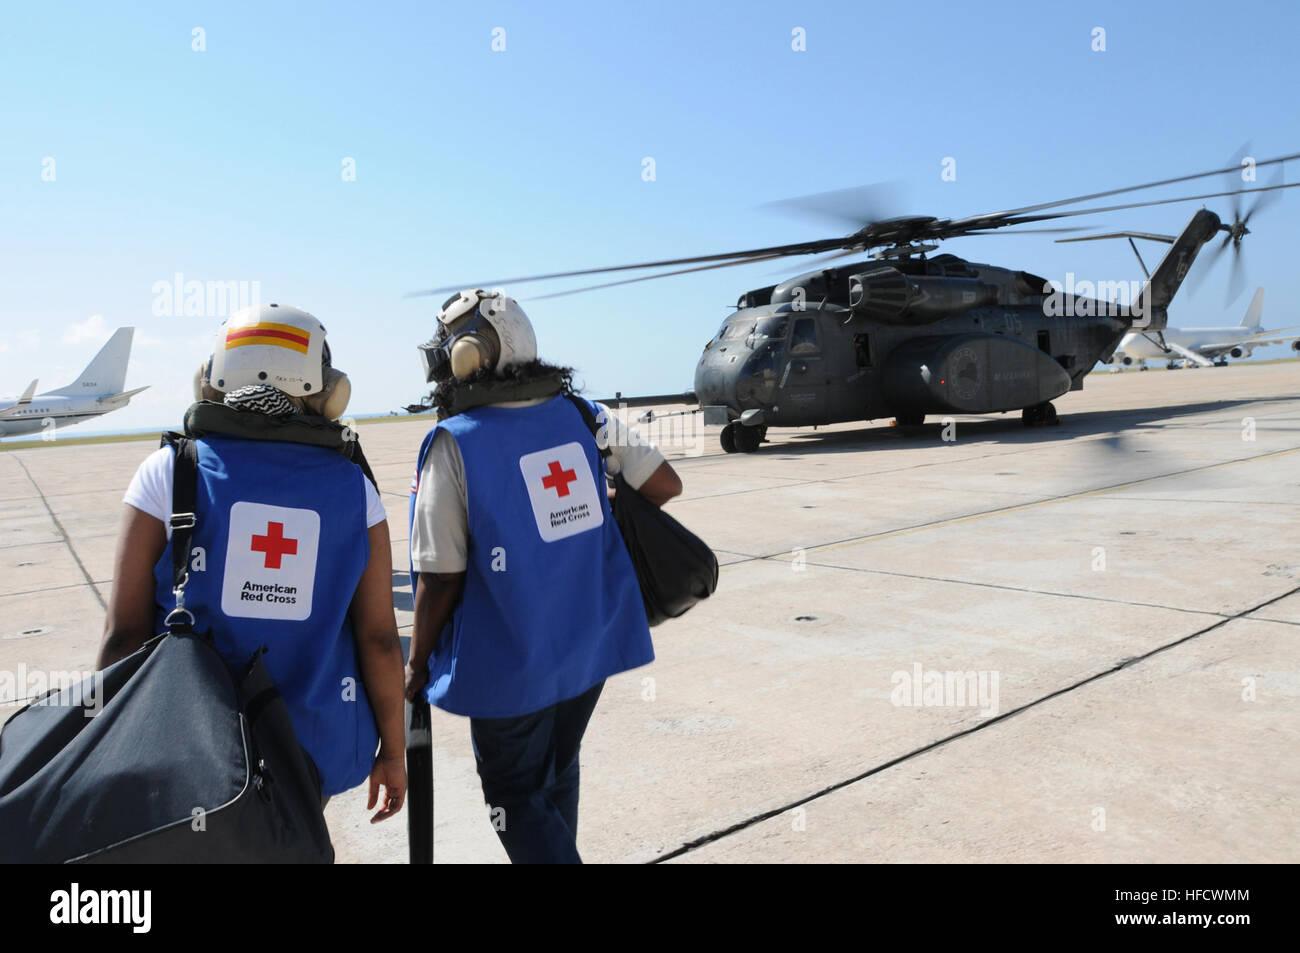 GUANTANAMO BAY, Cuba – American Red Cross volunteers board an MH-35E Sea Dragon helicopter bound for Haiti at U.S. Stock Photo